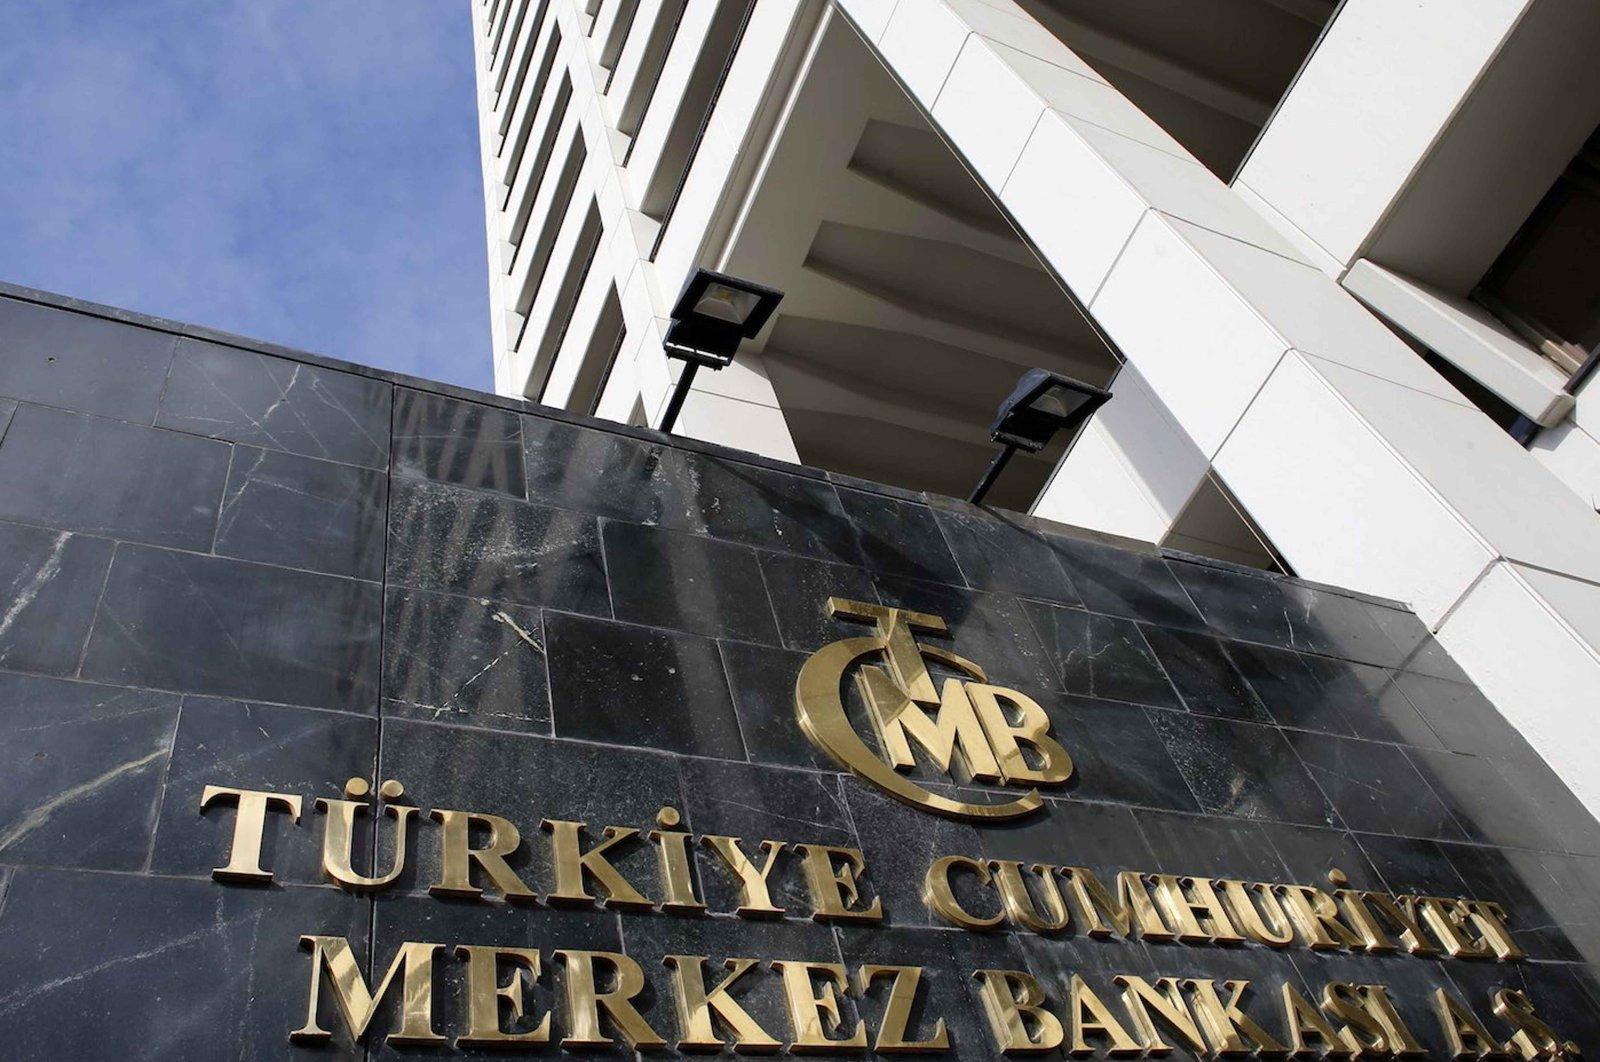 Turkey's Central Bank headquarters in Ankara, Jan. 24, 2014. (Reuters Photo)